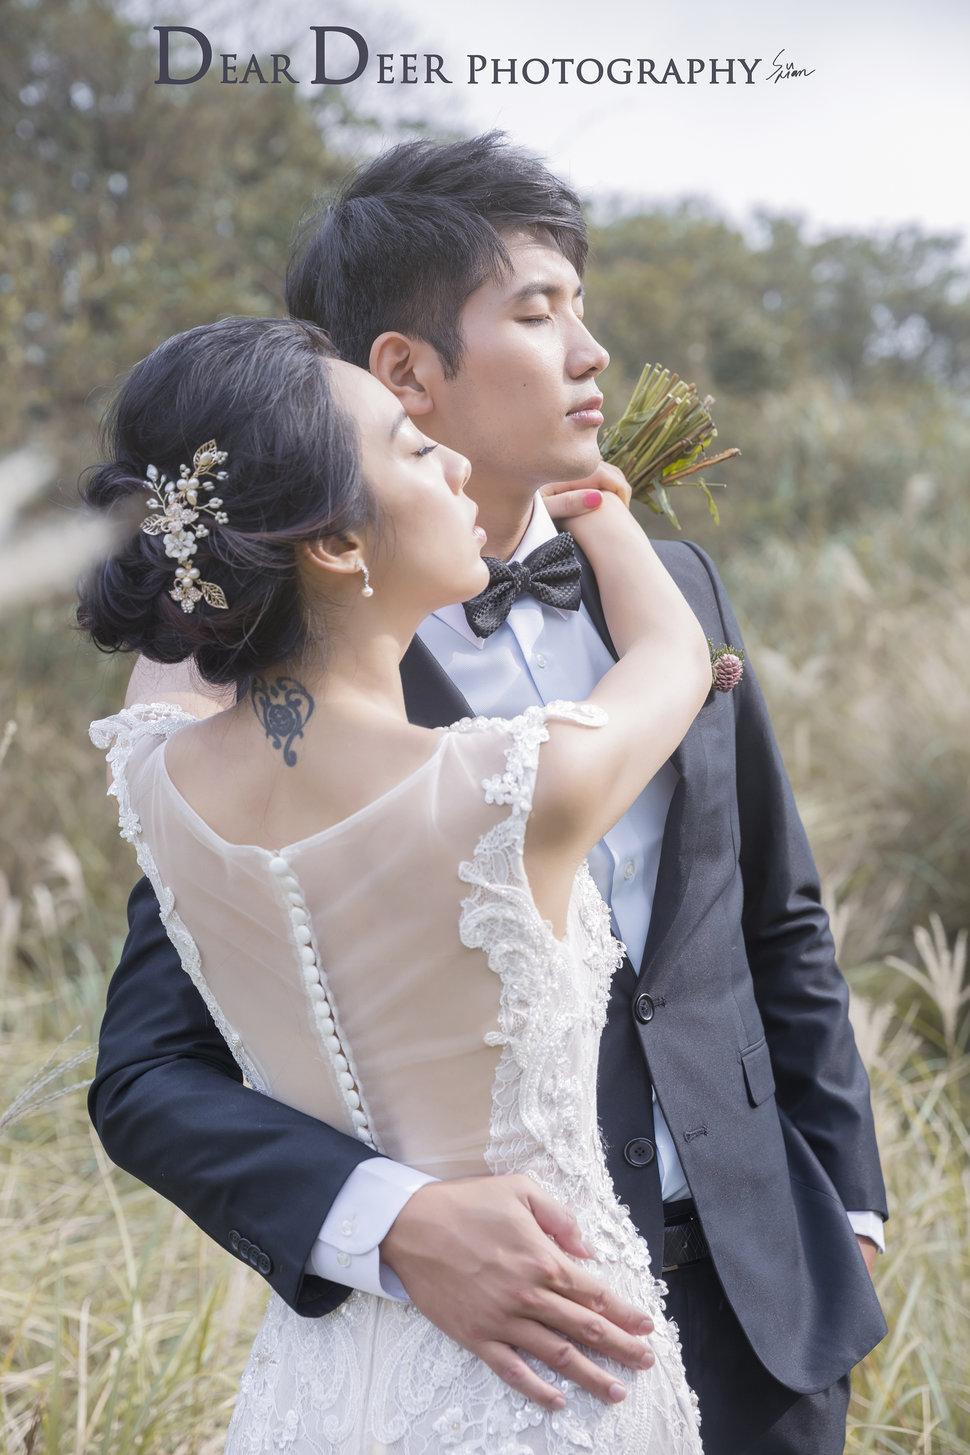 Dear Deer|花草仙女風格(編號:1280315) - Dear Deer鹿兒攝影|女攝影師蘇蔓 - 結婚吧